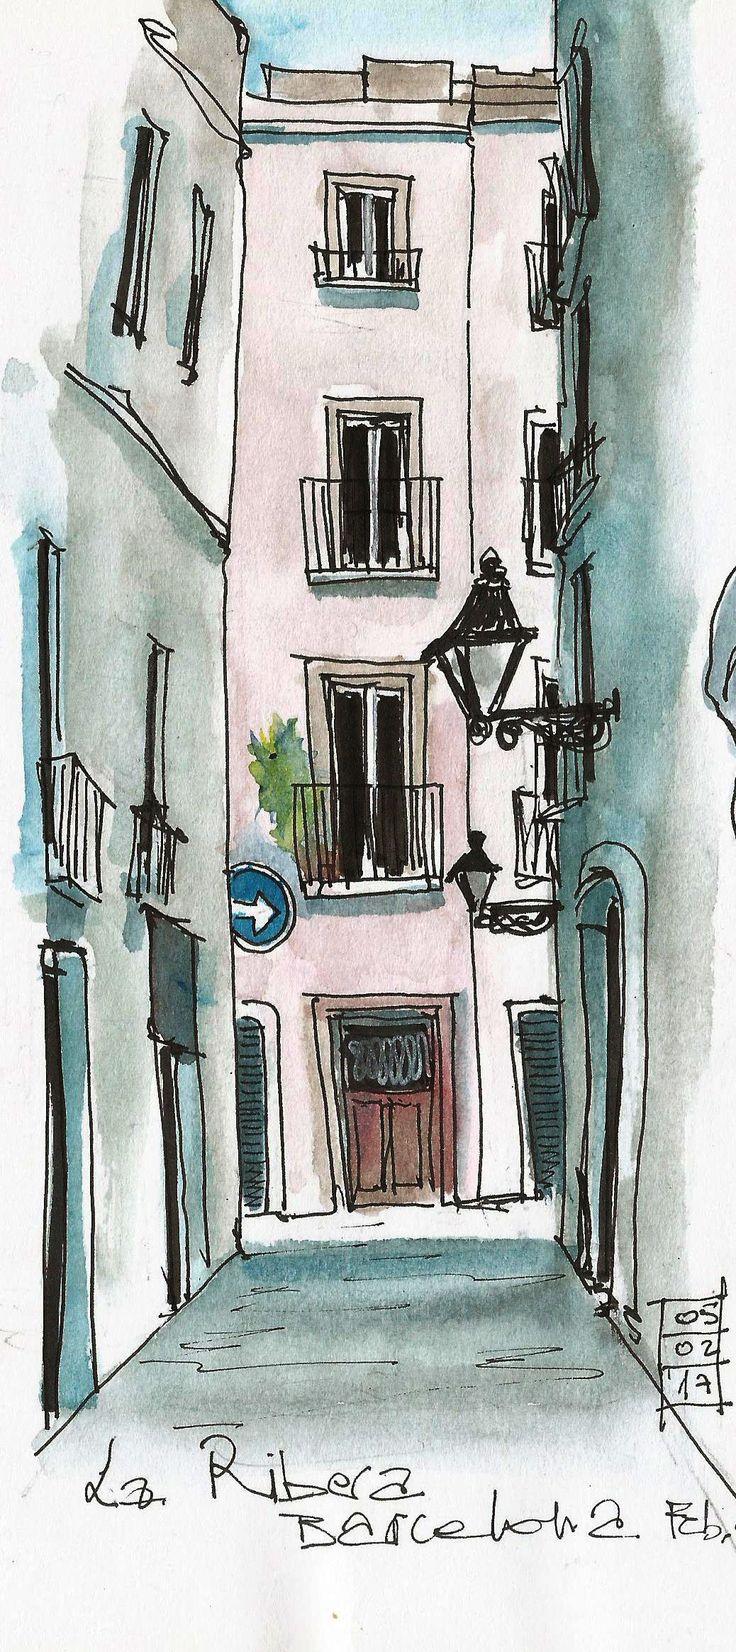 City sketching el Born elborn-barcelone-barcelona- urbansketching-croquisurbain…